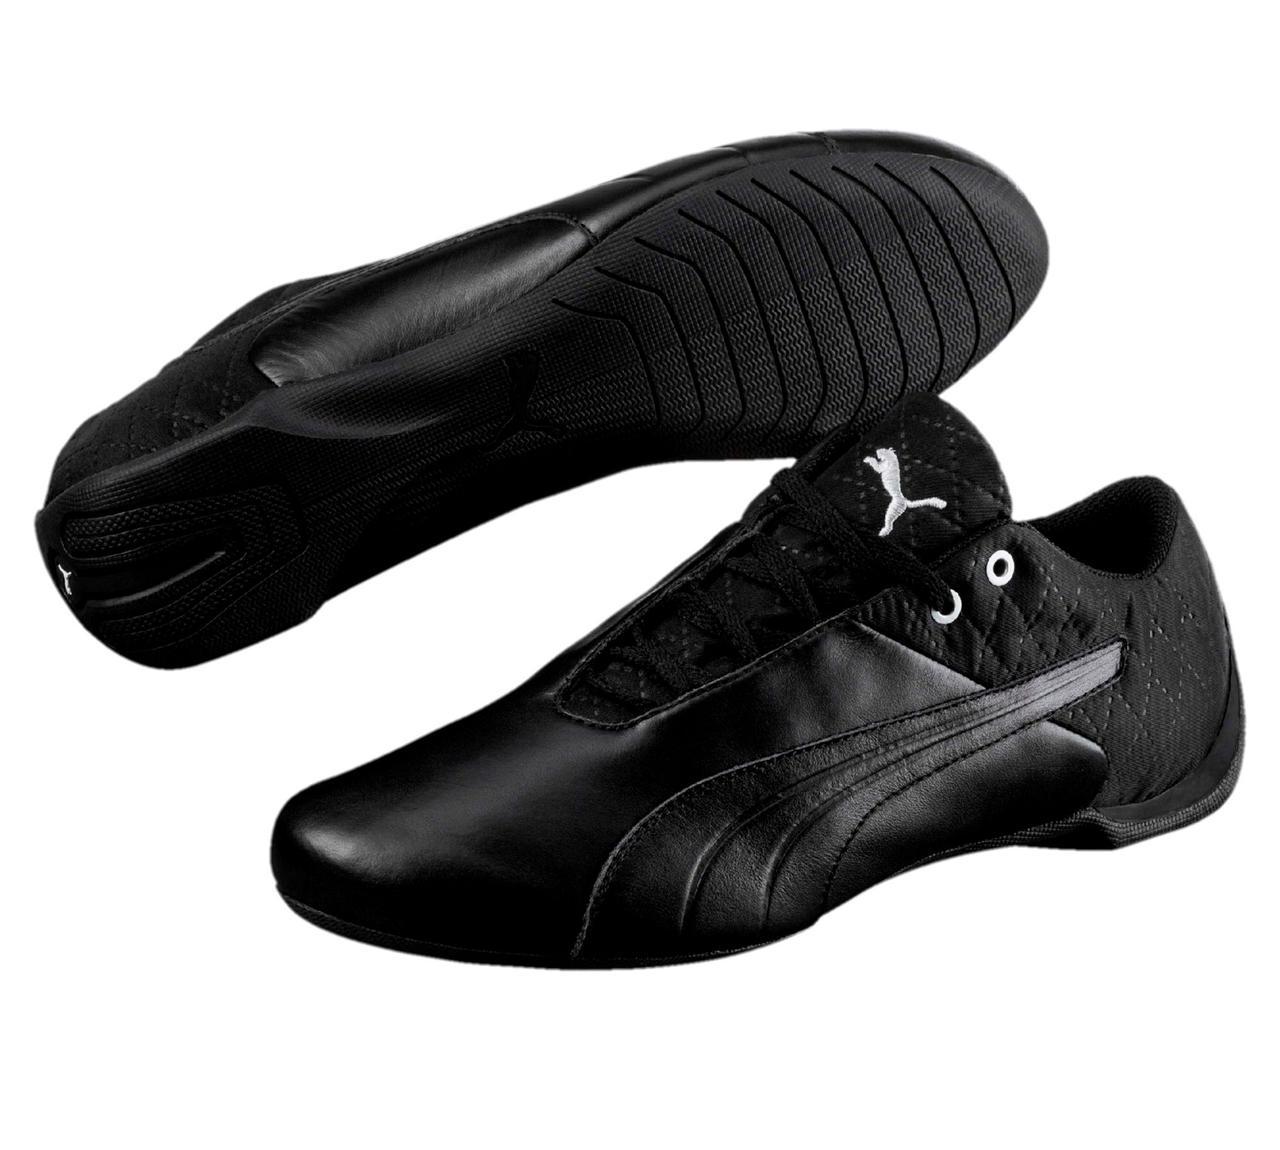 Мужские кроссовки PUMA FUTURE CAT REENG 363815 01